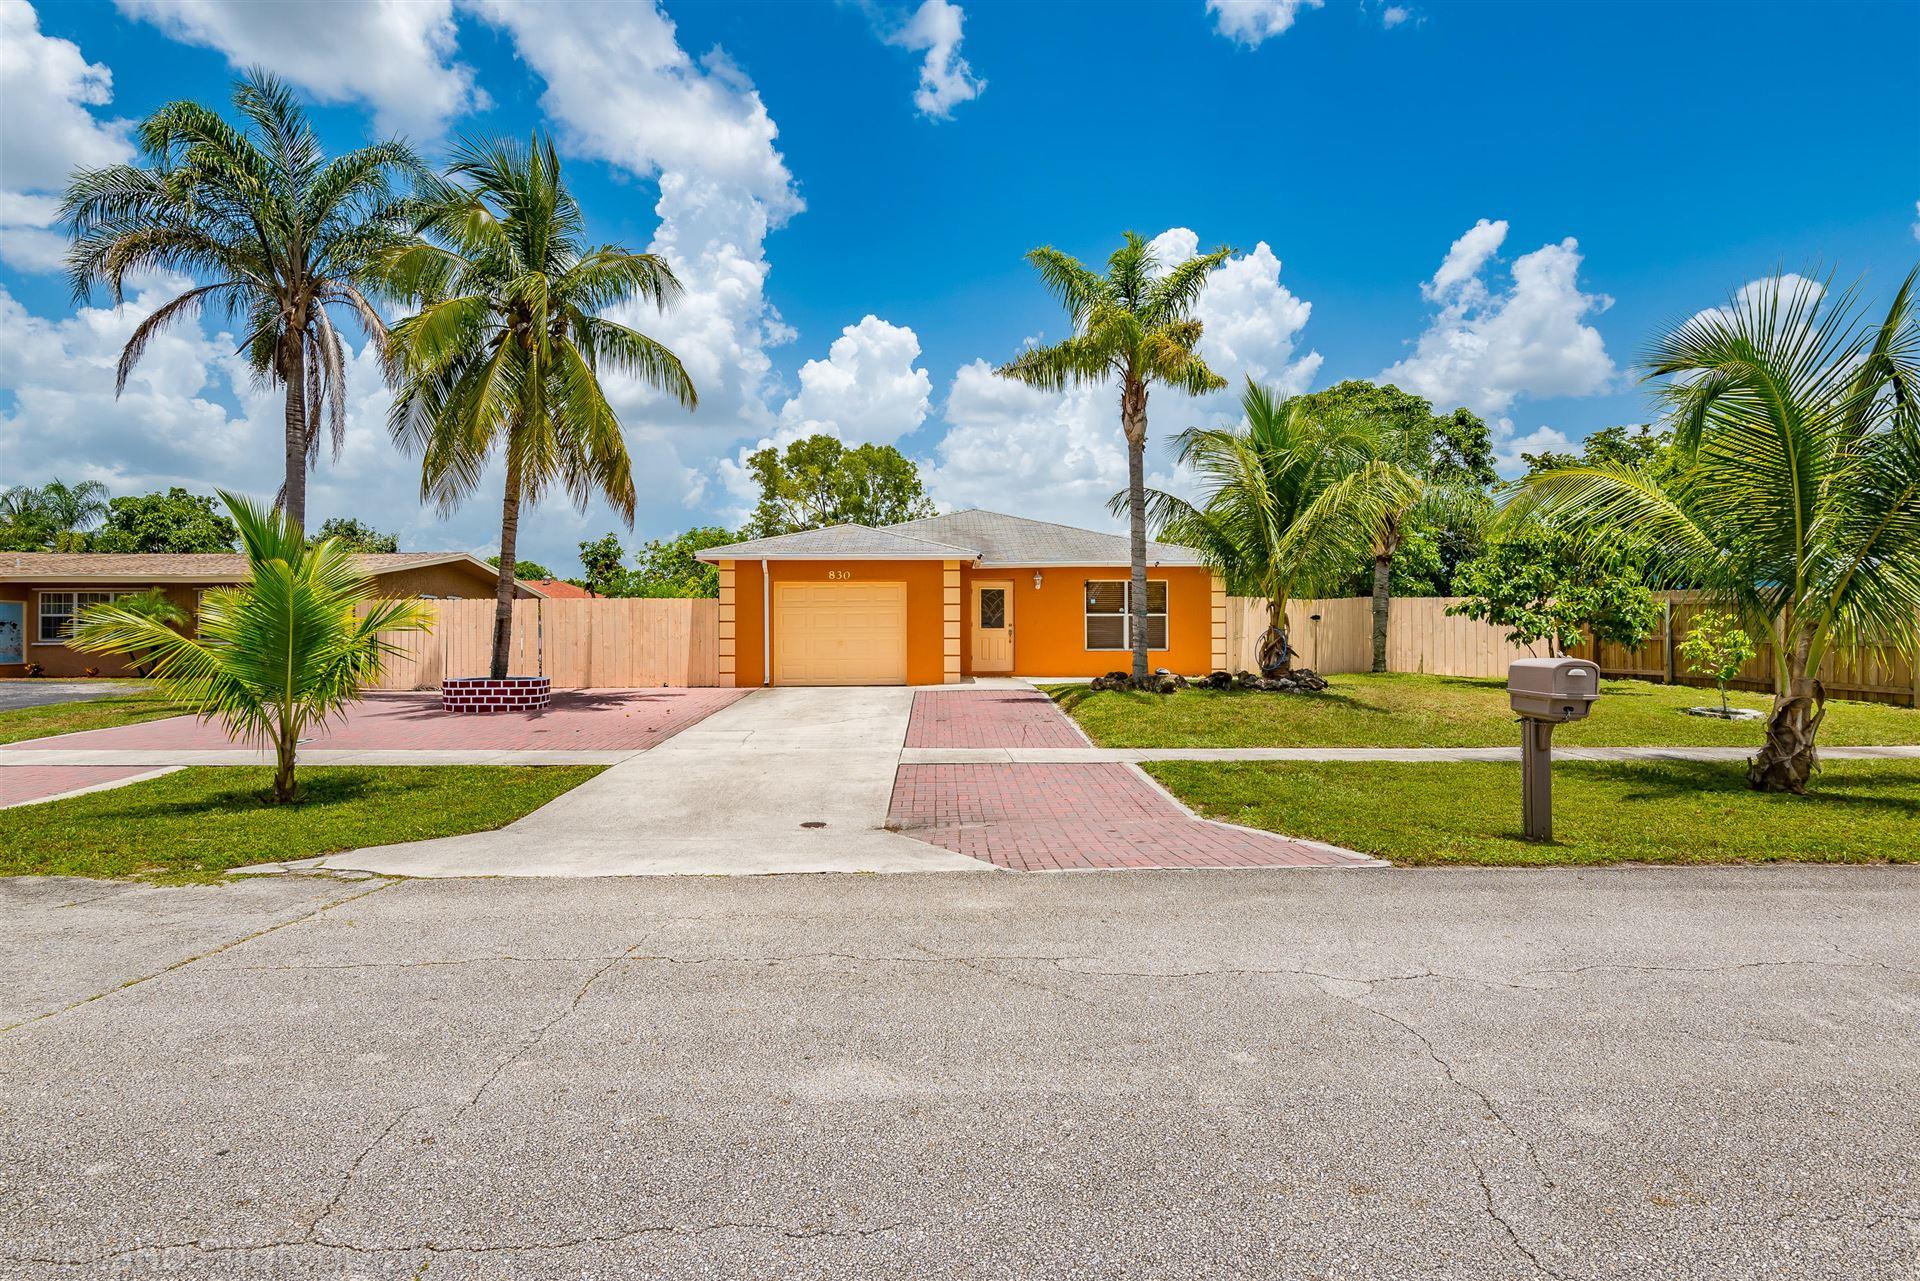 830 Azalea Drive, Royal Palm Beach, FL 33411 - #: RX-10632620